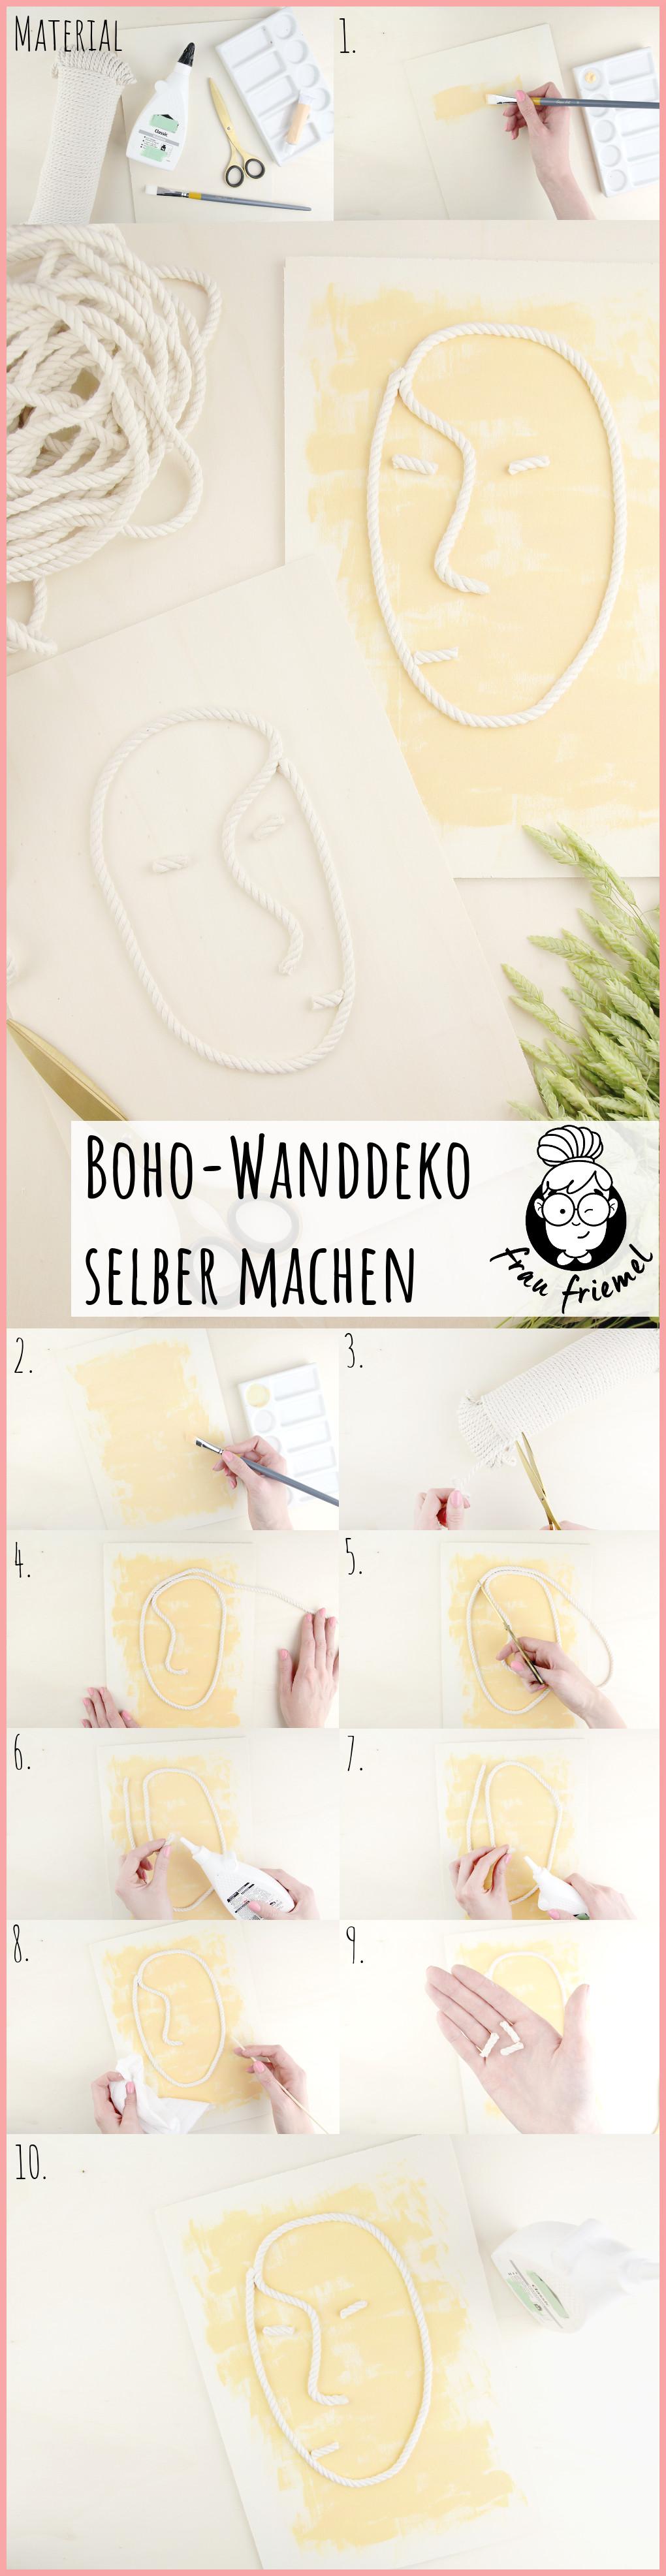 Boho Wanddeko selber machen mit frau friemel - Gesamtanleitung